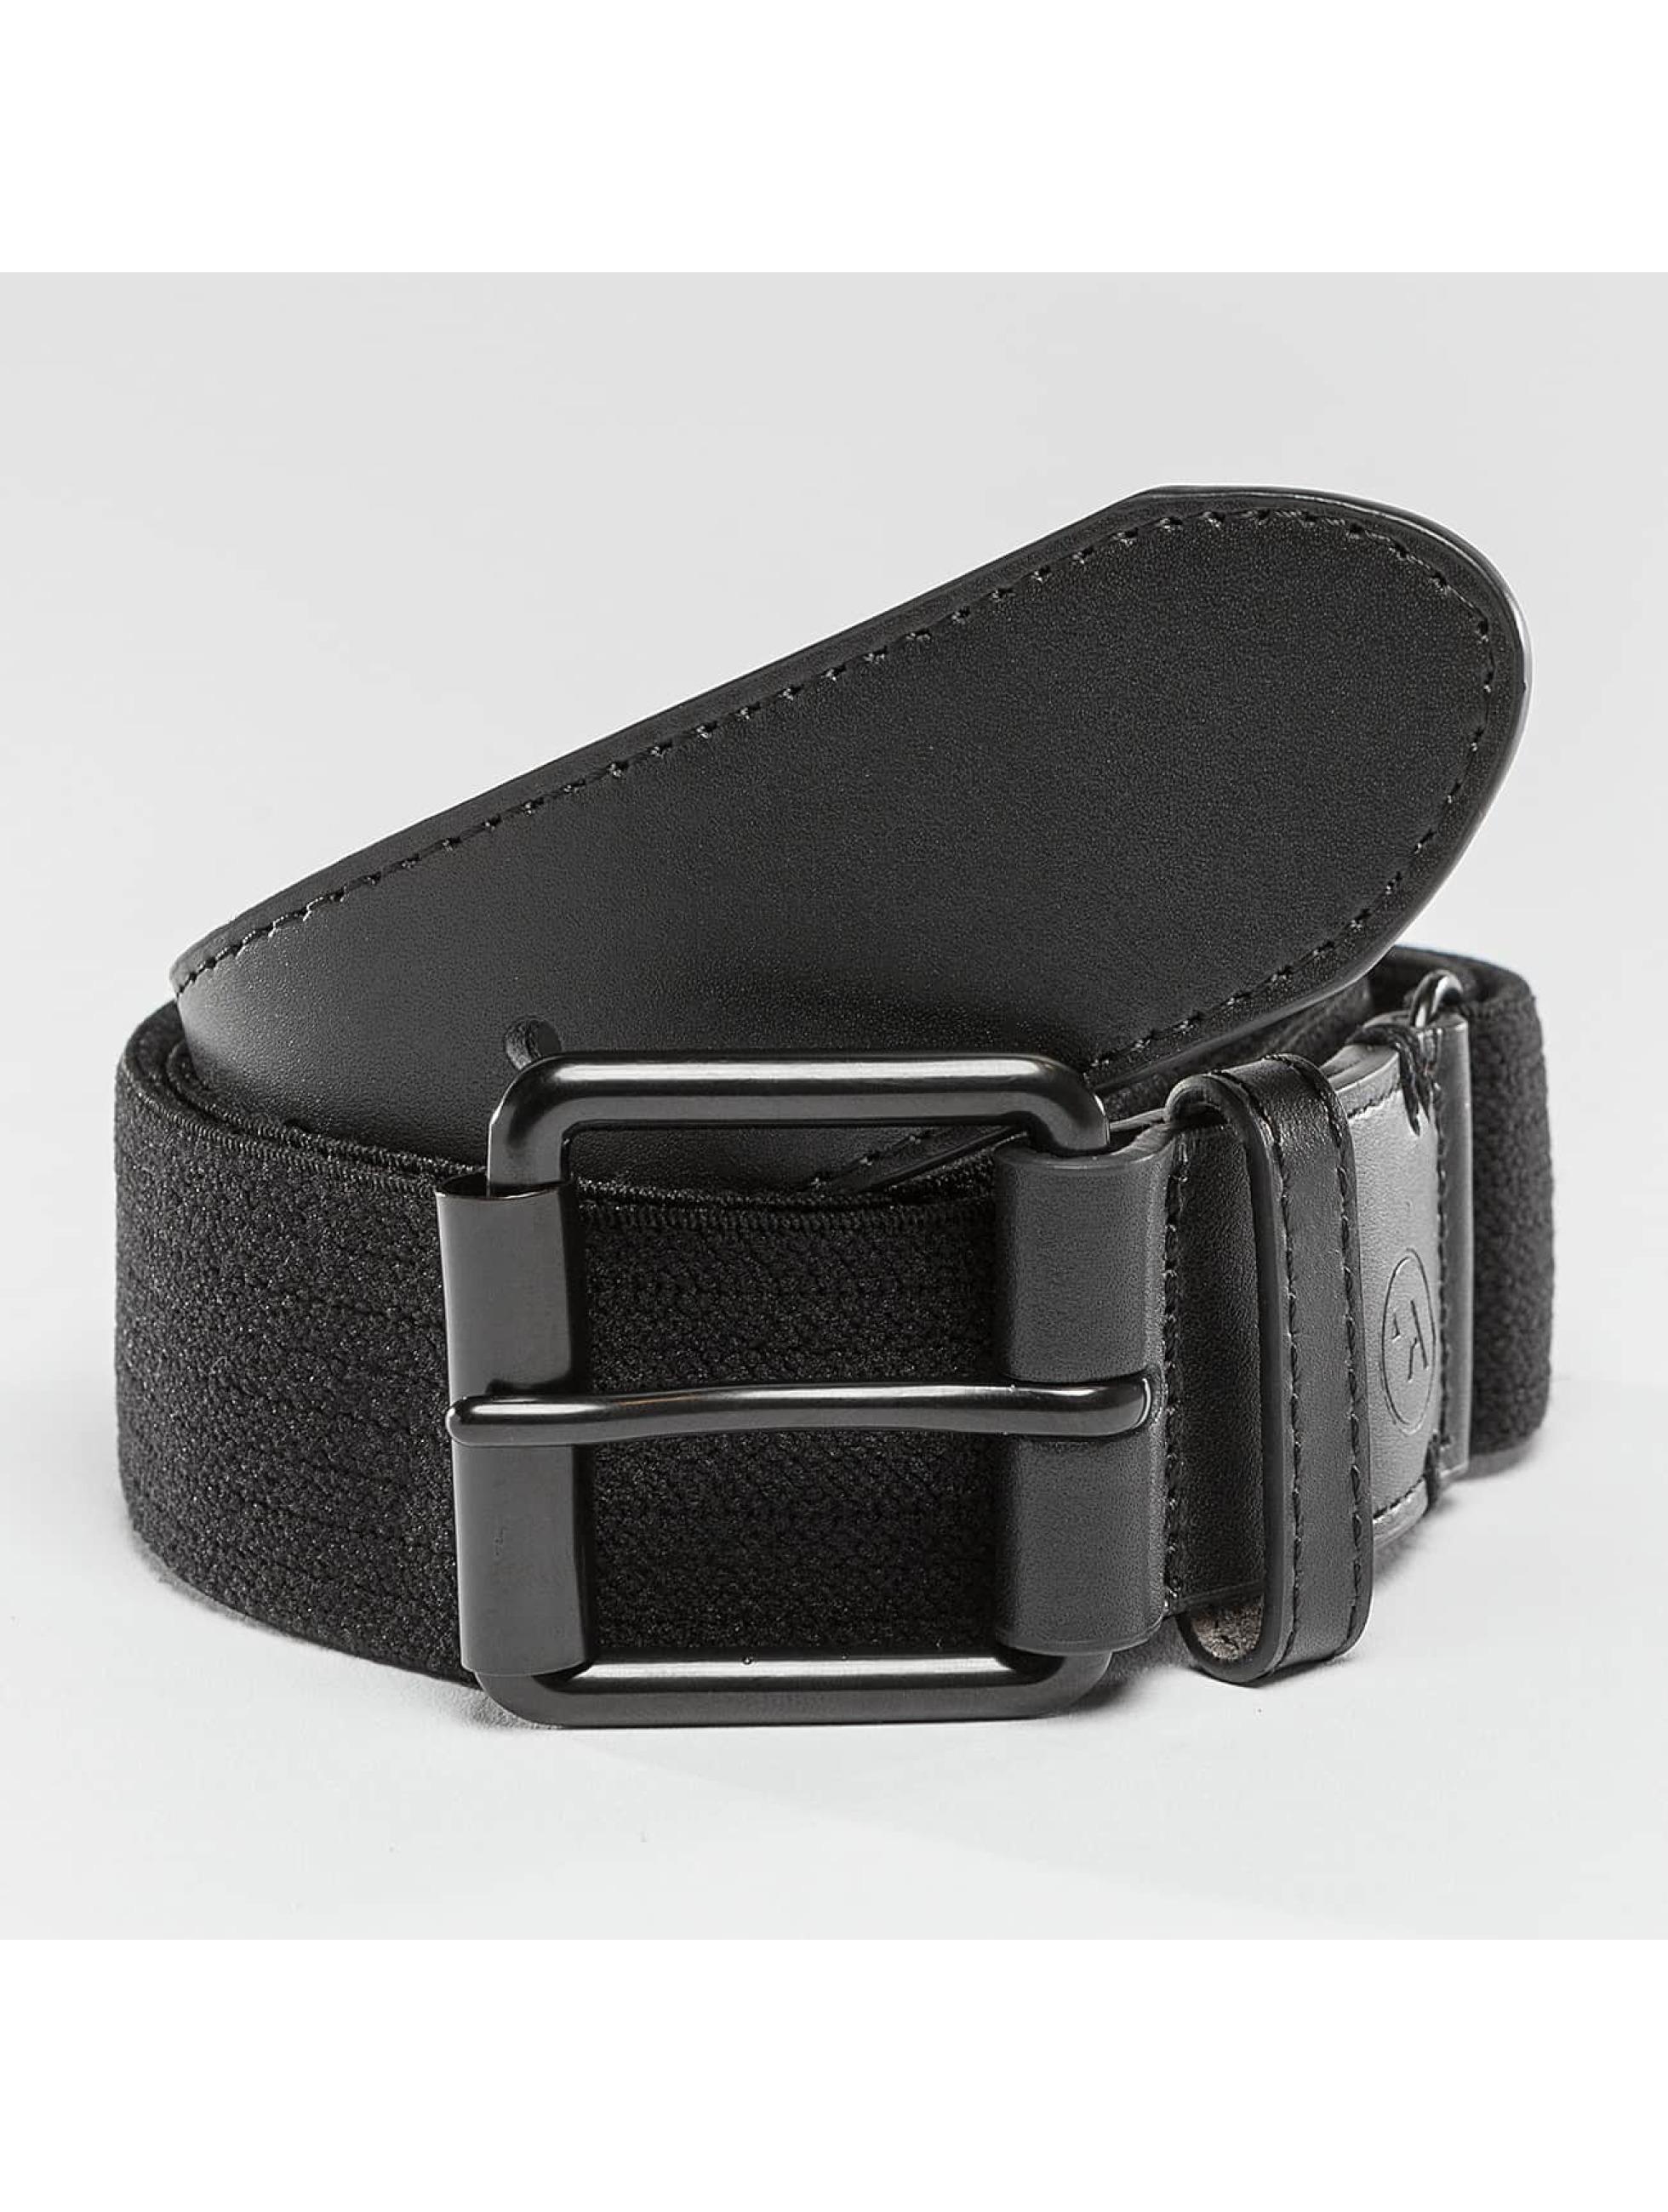 ARCADE Belt he Corsair black